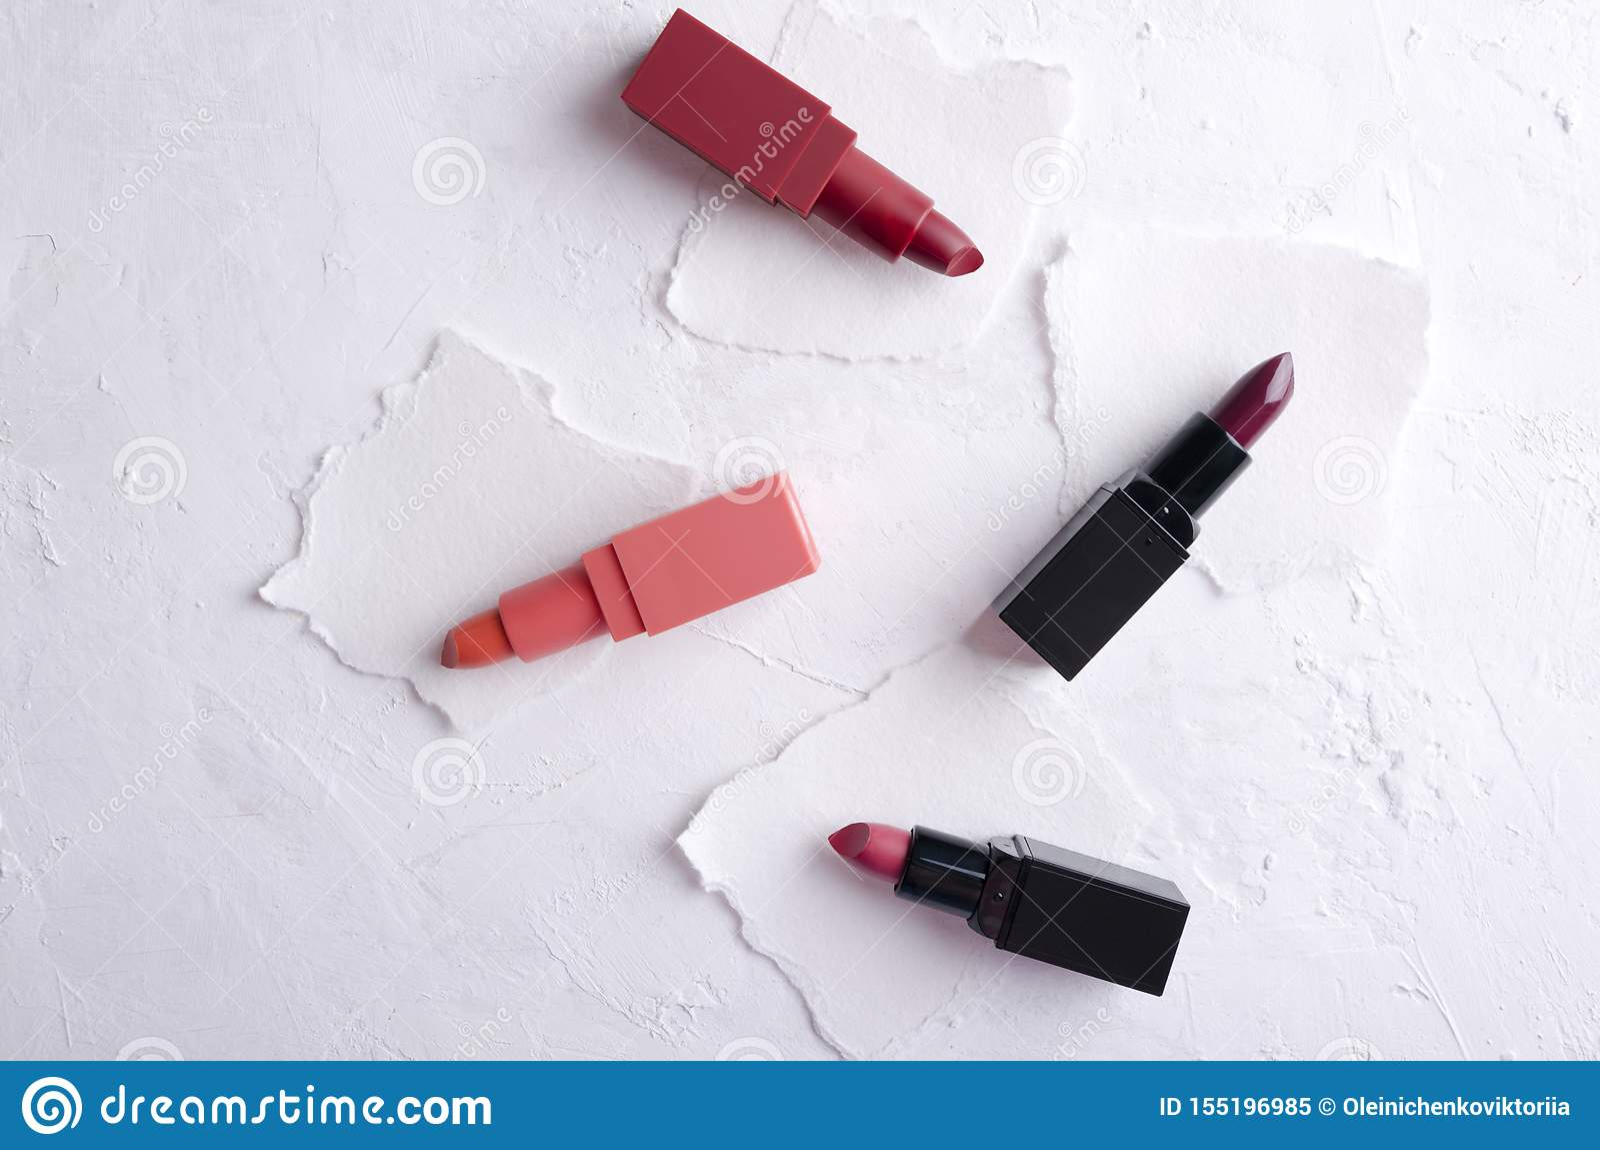 Ejemplos de diversos colores de barras de labios en el papel